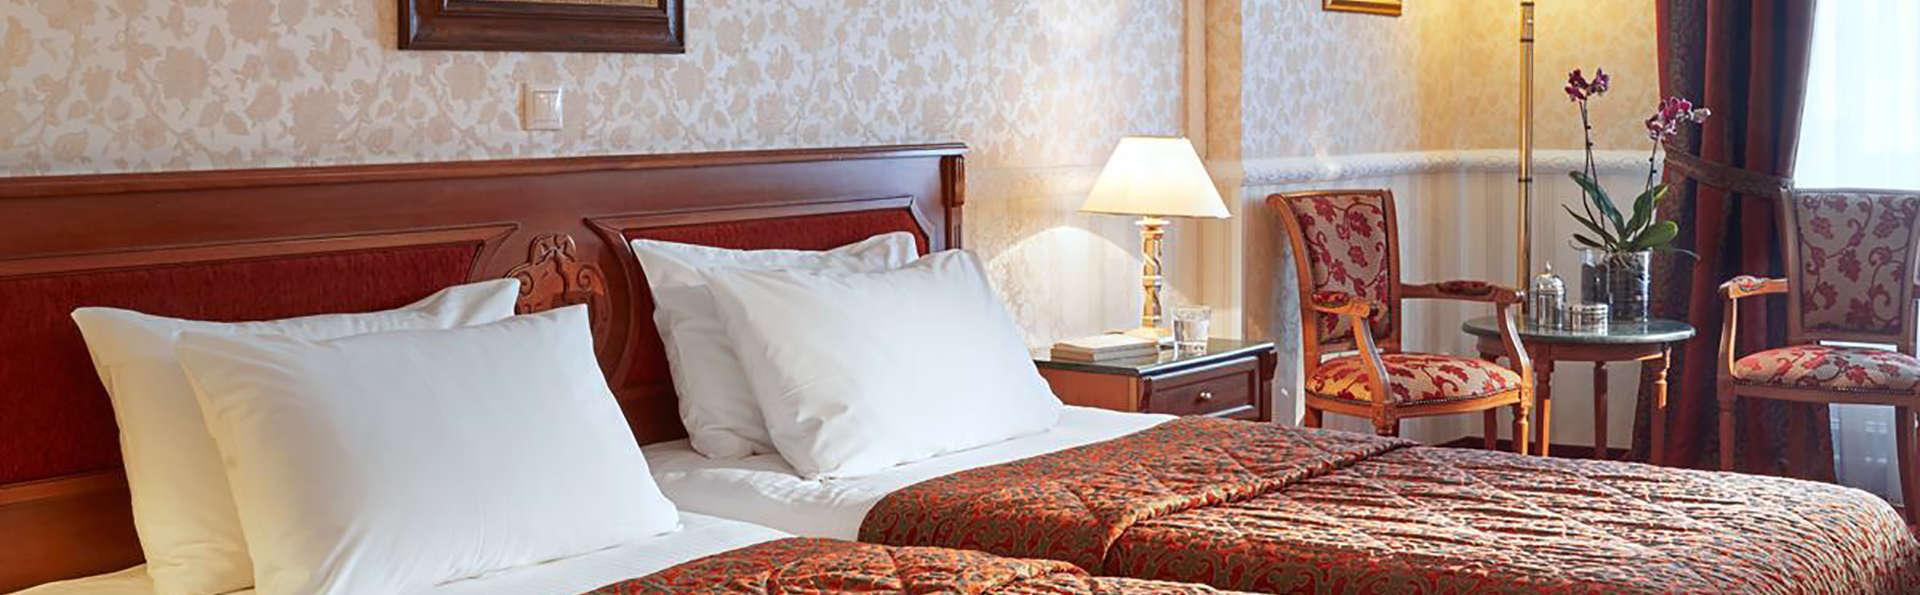 Grand Hotel Palace - edit_room6.jpg